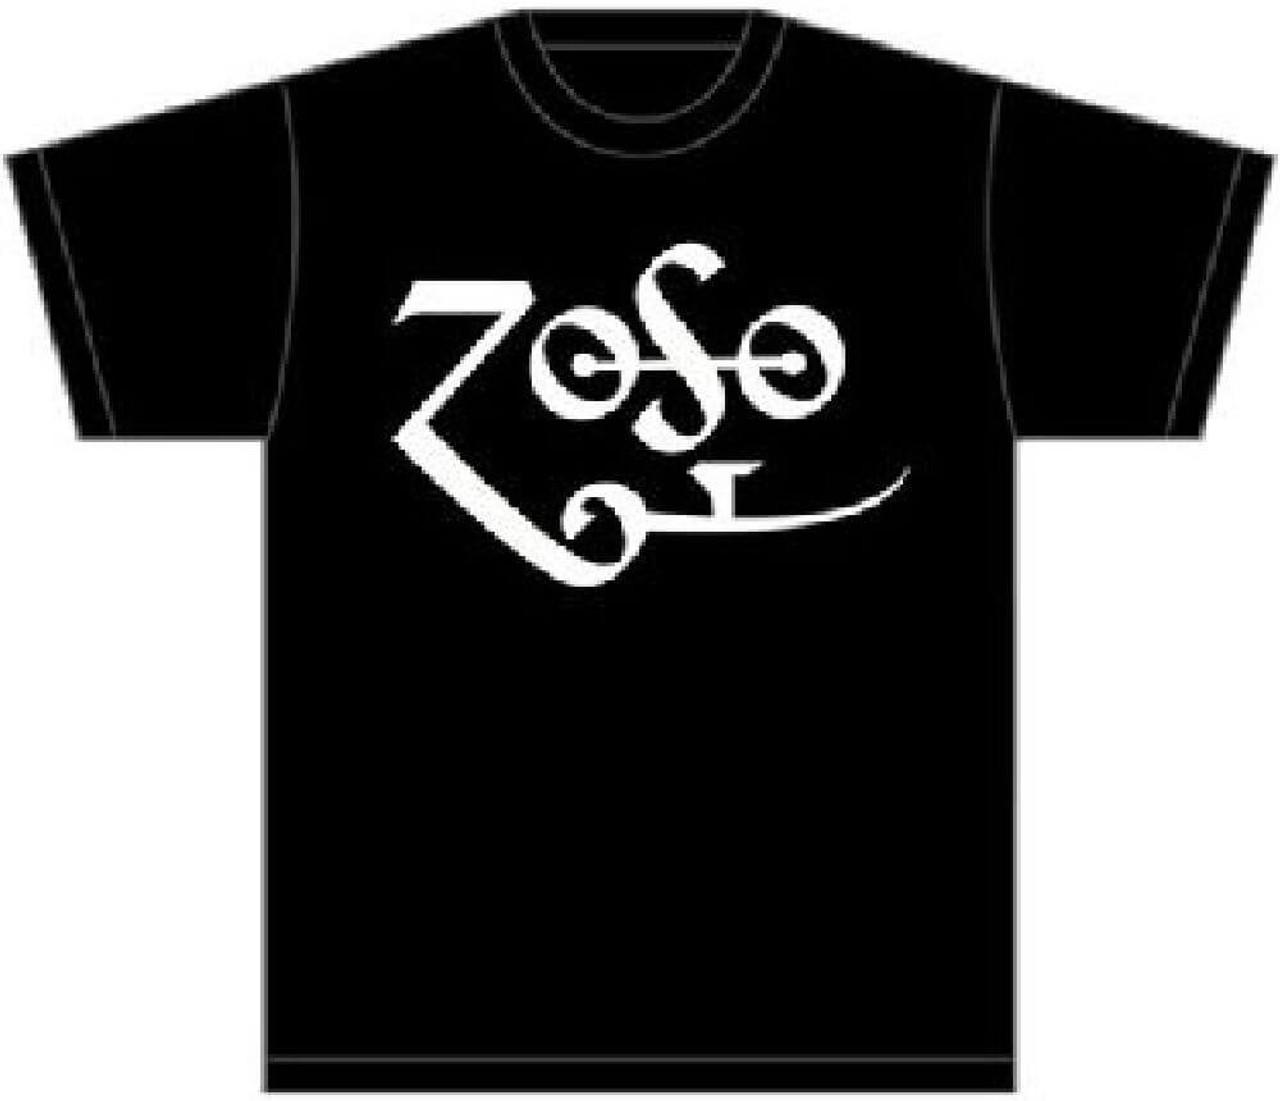 Led Zeppelin Jimmy Page Zoso Symbol Mens Black T Shirt Rocker Rags